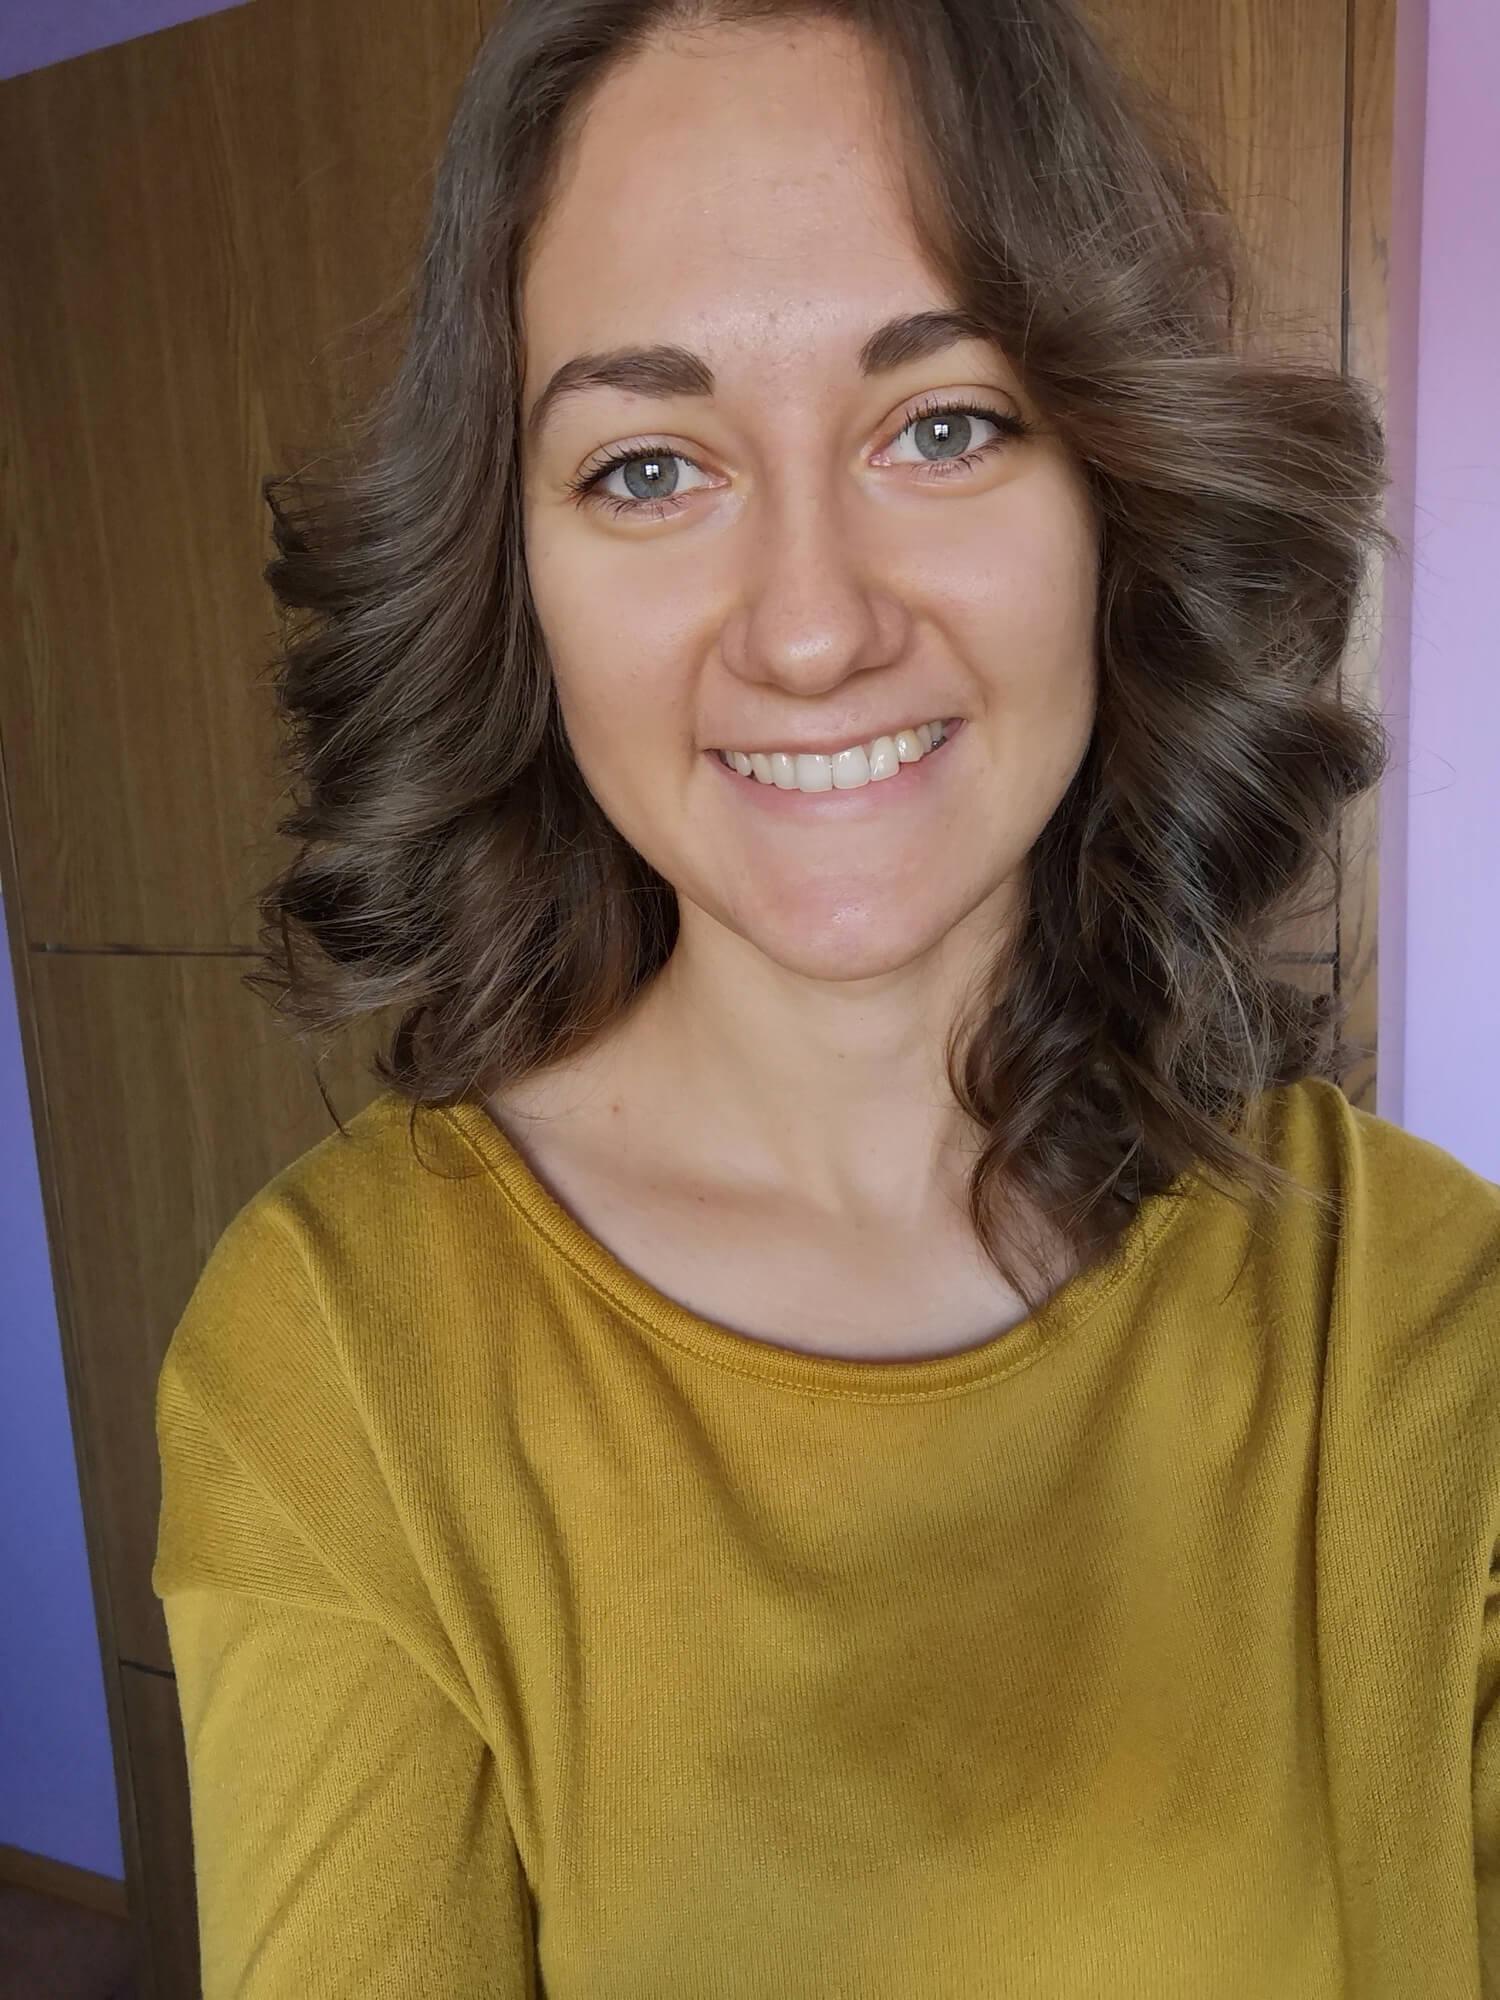 Portrait_Sabrina-Liegl_FH-Praktikantin_Diaetologie-Eberharter